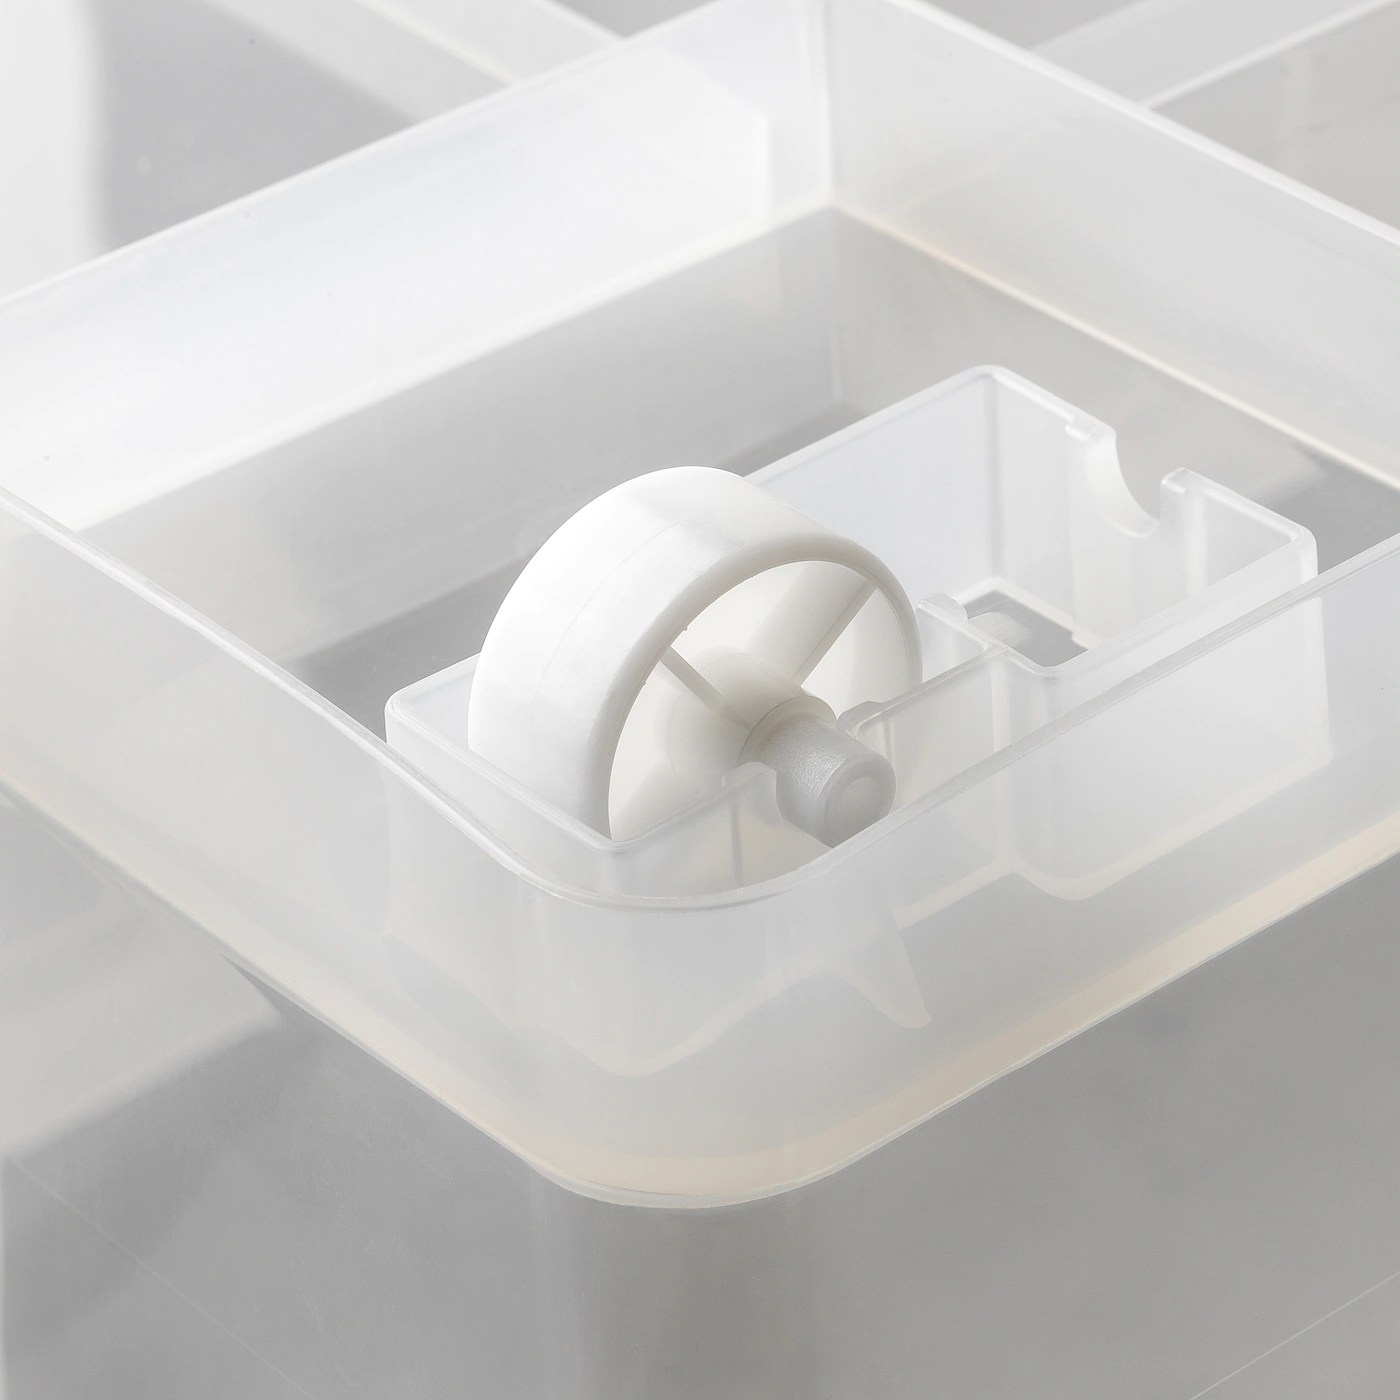 Samla Boite Transparent 78x56x43 Cm 130 L Ikea